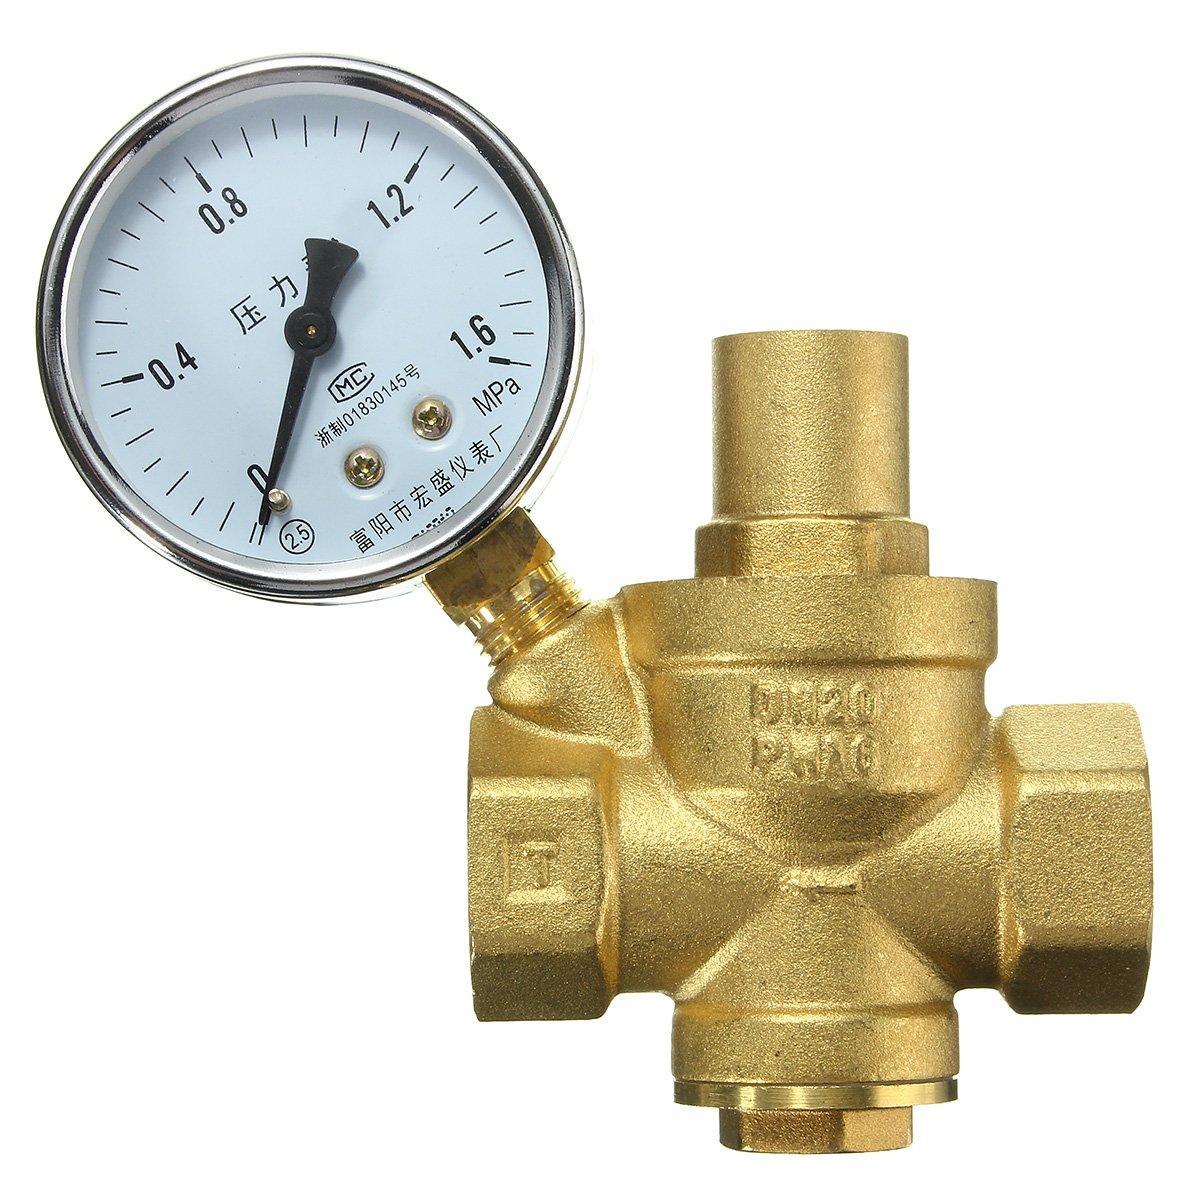 DN20 3/4inch Brass Water Pressure Reducing Valve With Gauge Flow Adjustable